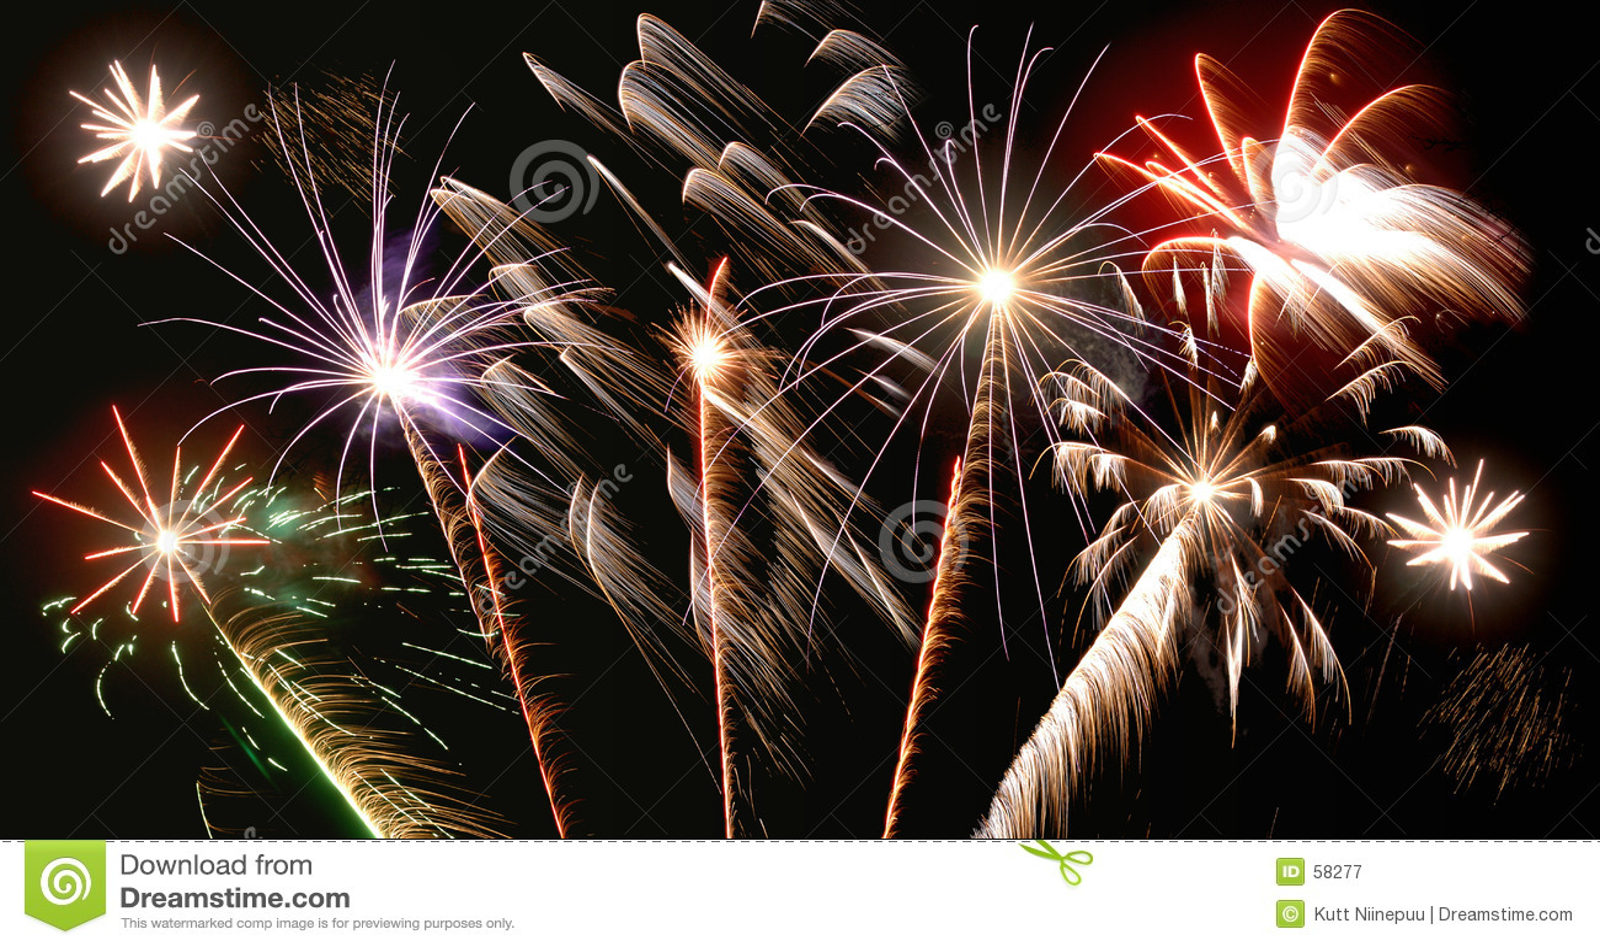 Different fireworks